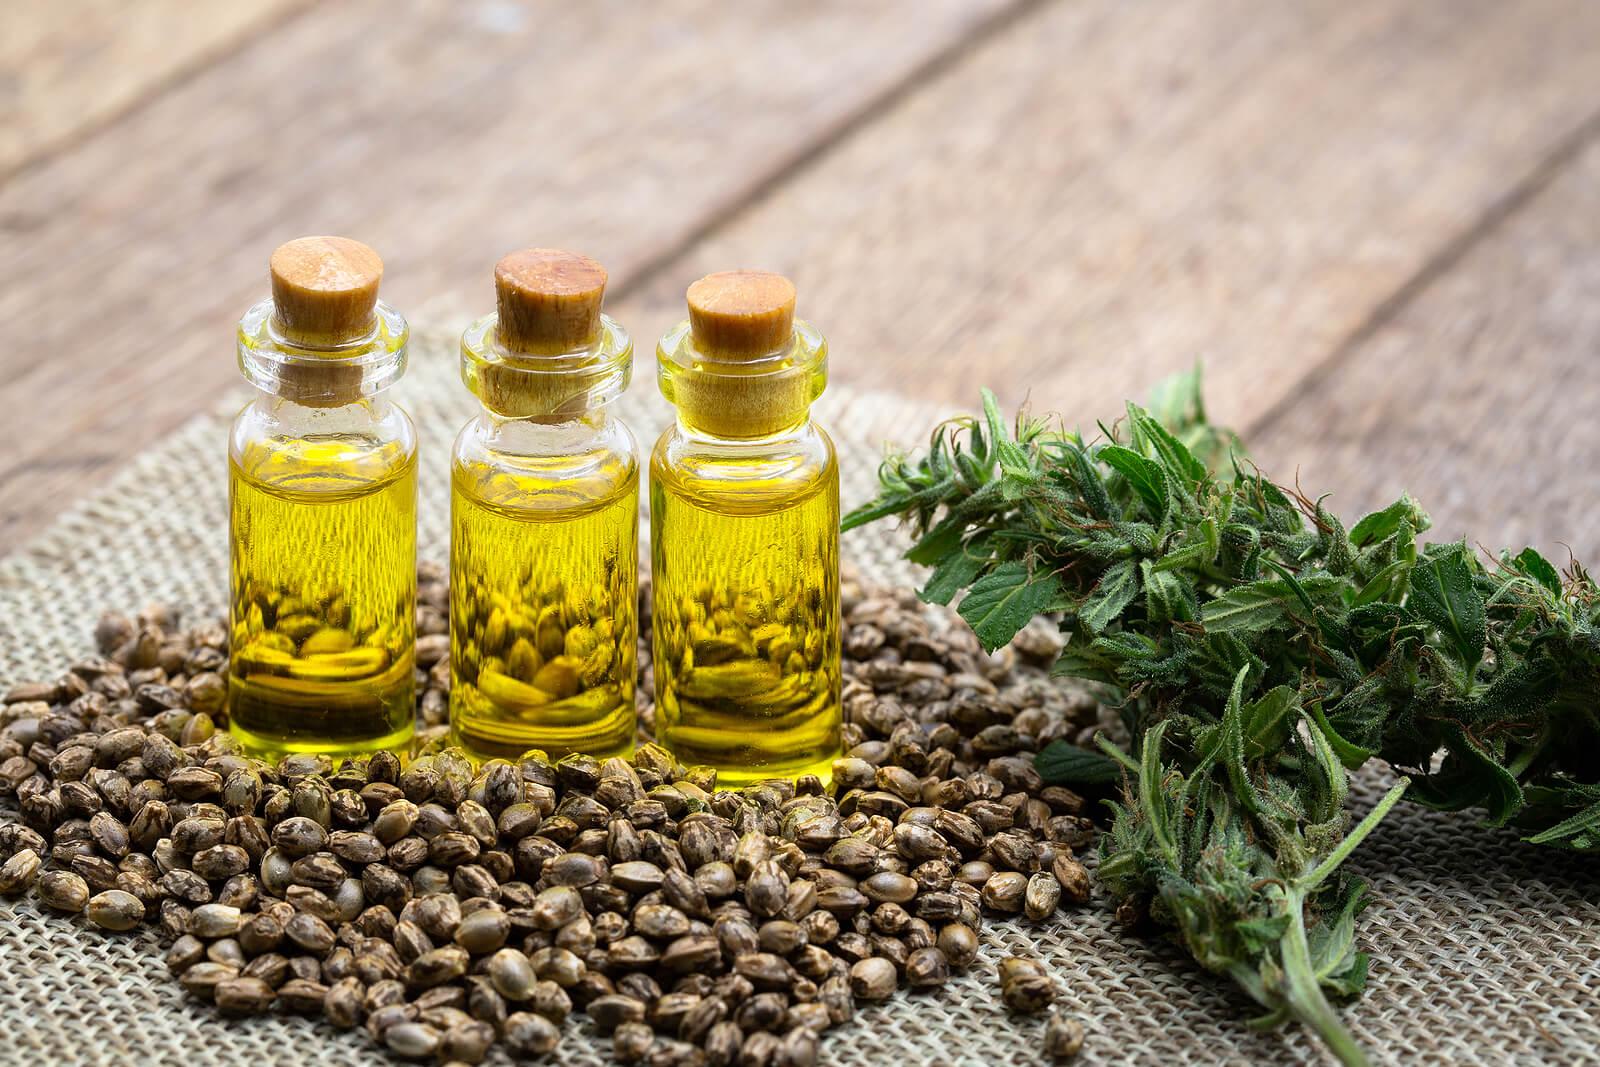 Buy Marijuana Seeds In Herculaneum